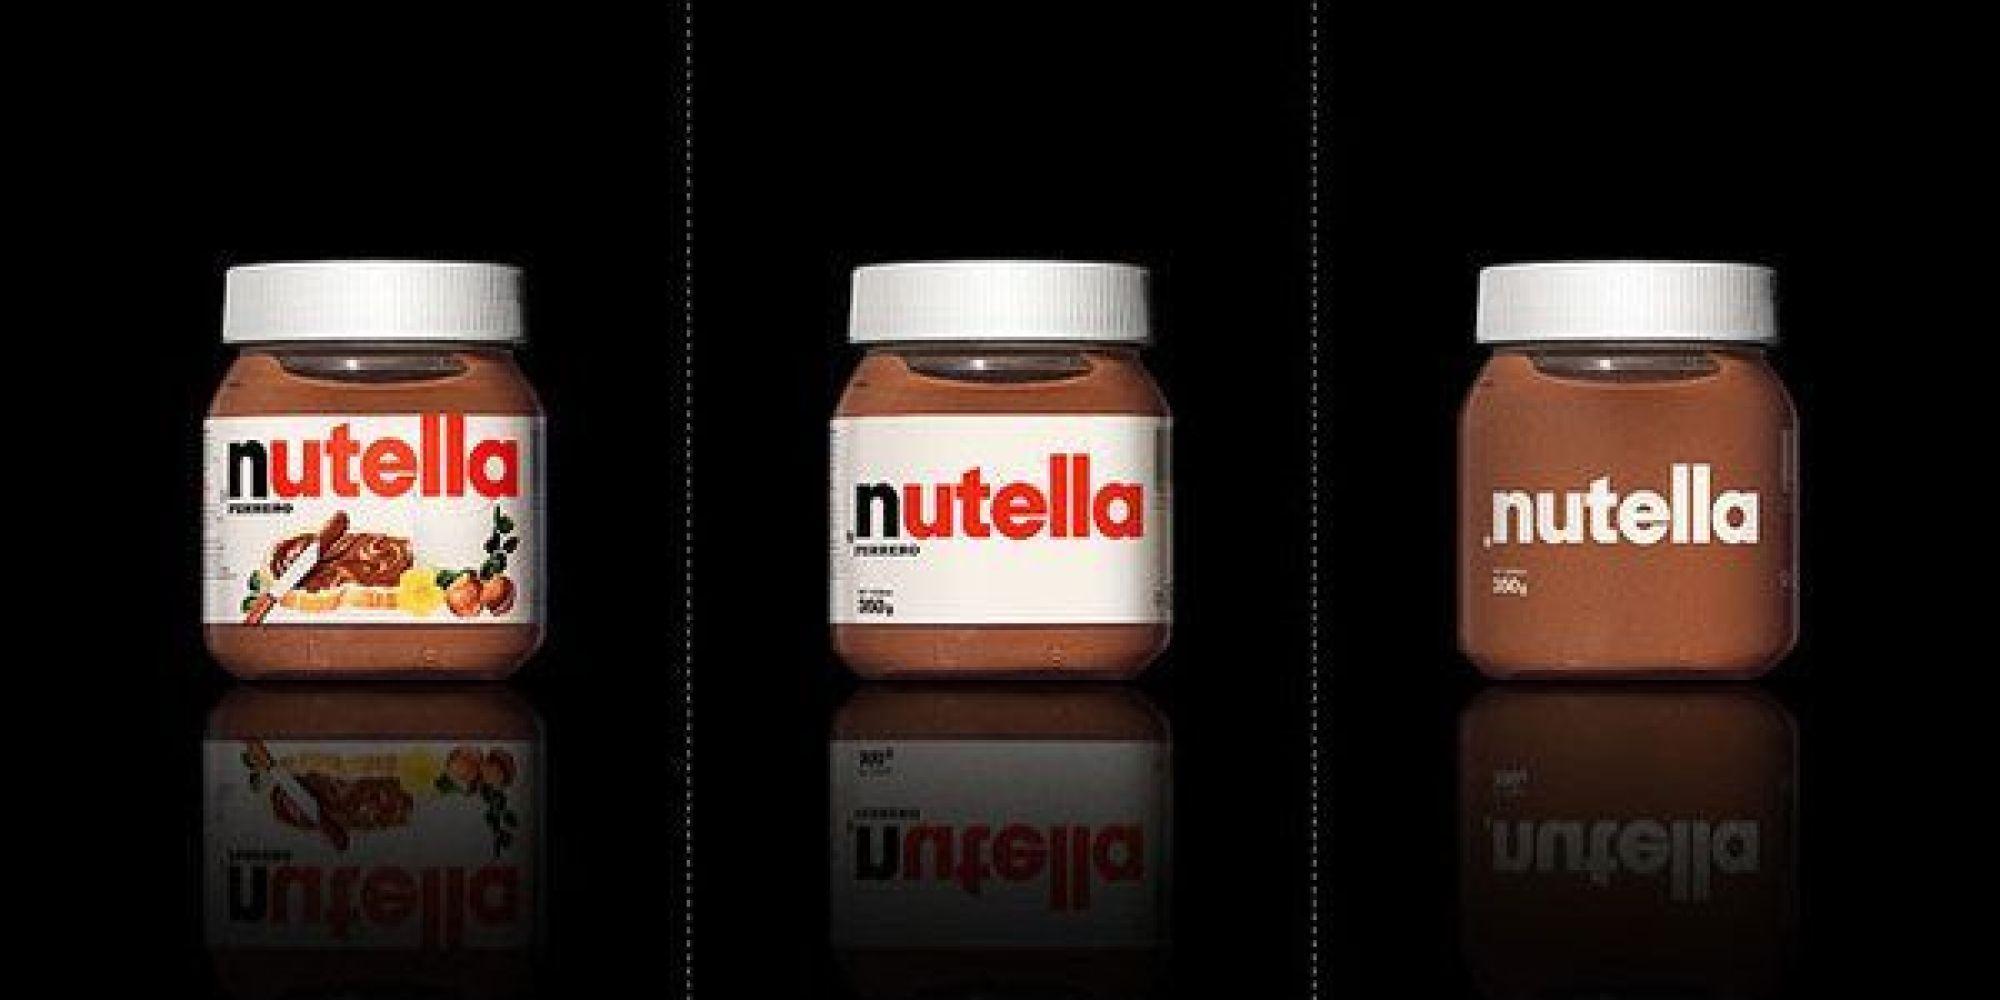 14 logos et emballages simplifi s photos for Design minimalista